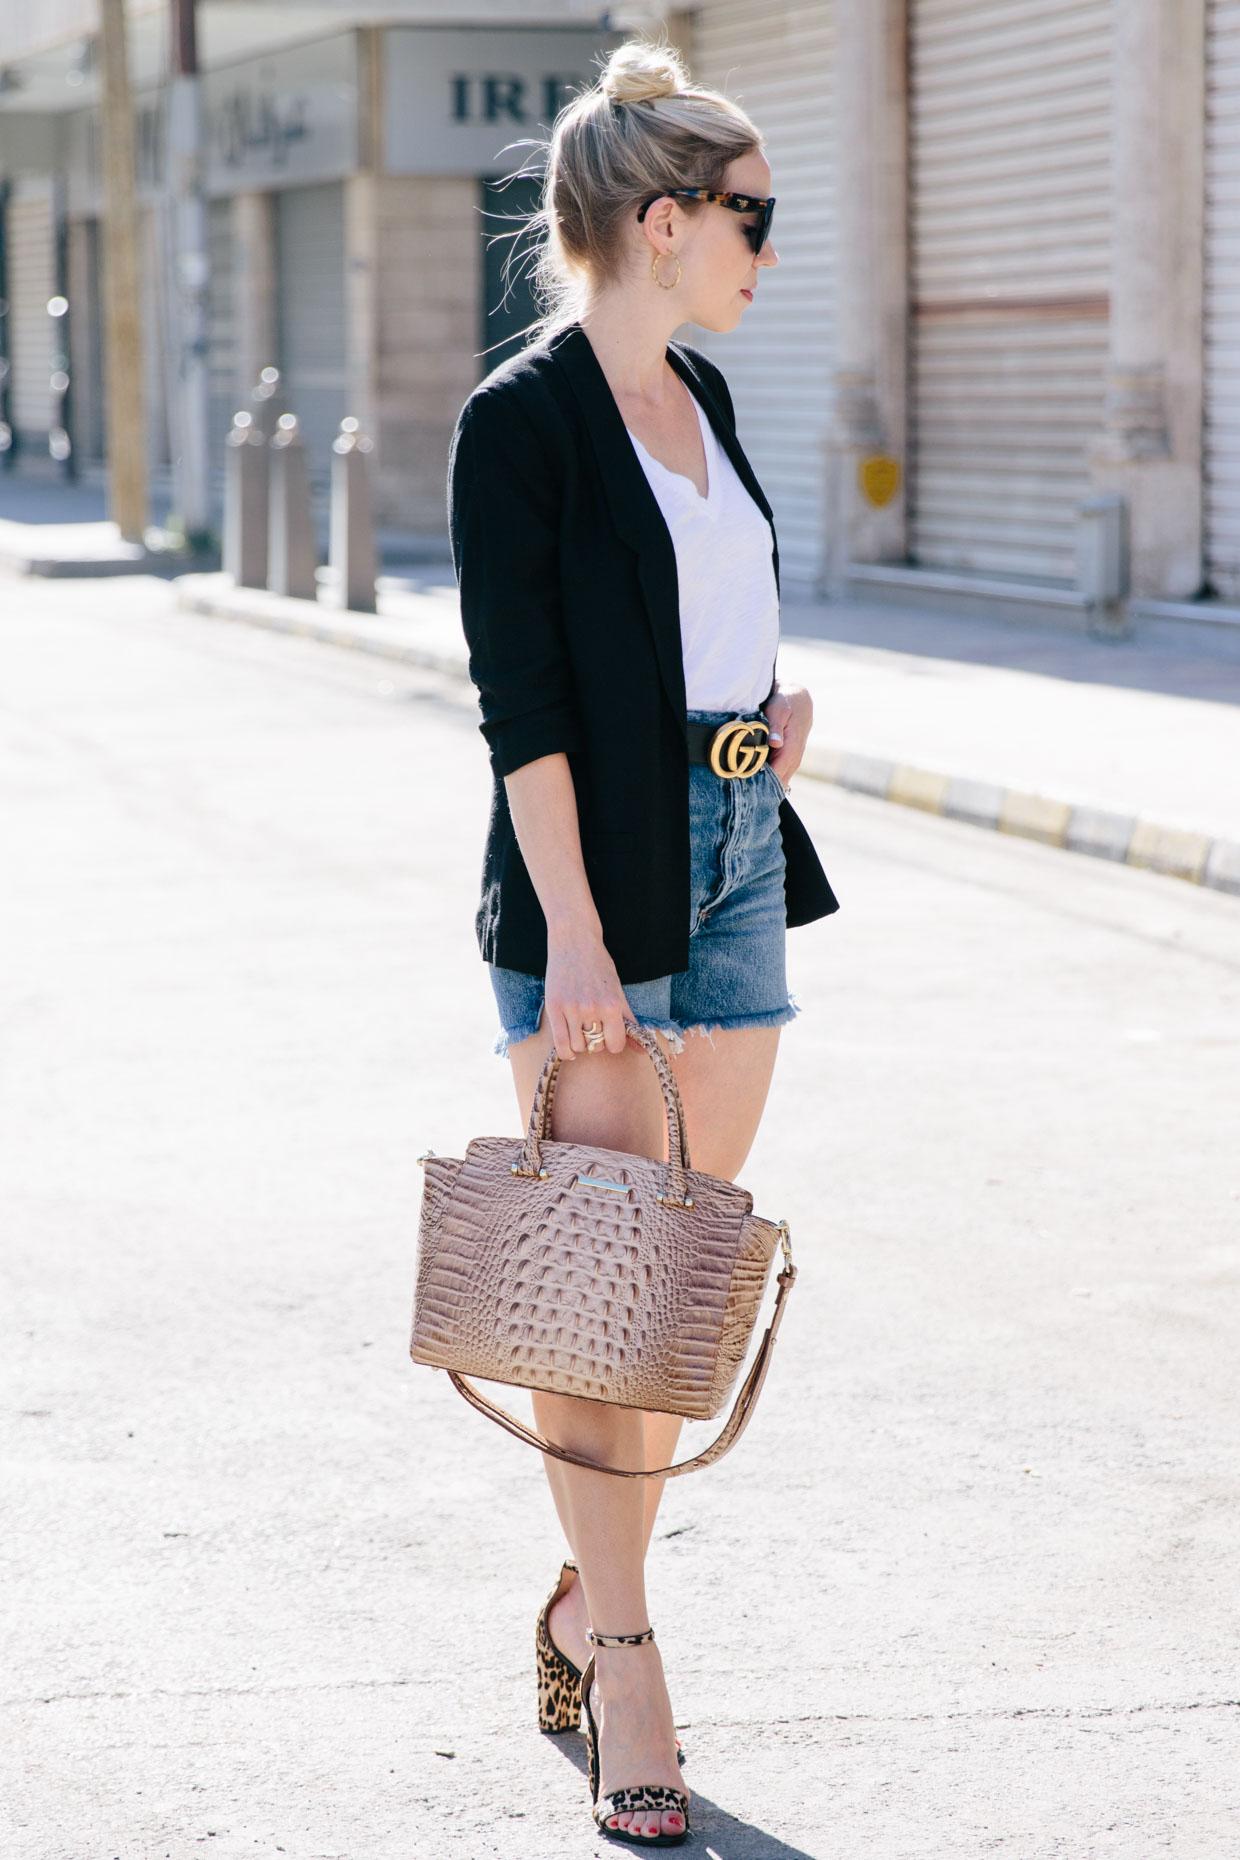 7ea53e73a9d Meagan Brandon fashion blogger of Meagan s Moda wears black boyfriend  blazer with white tee